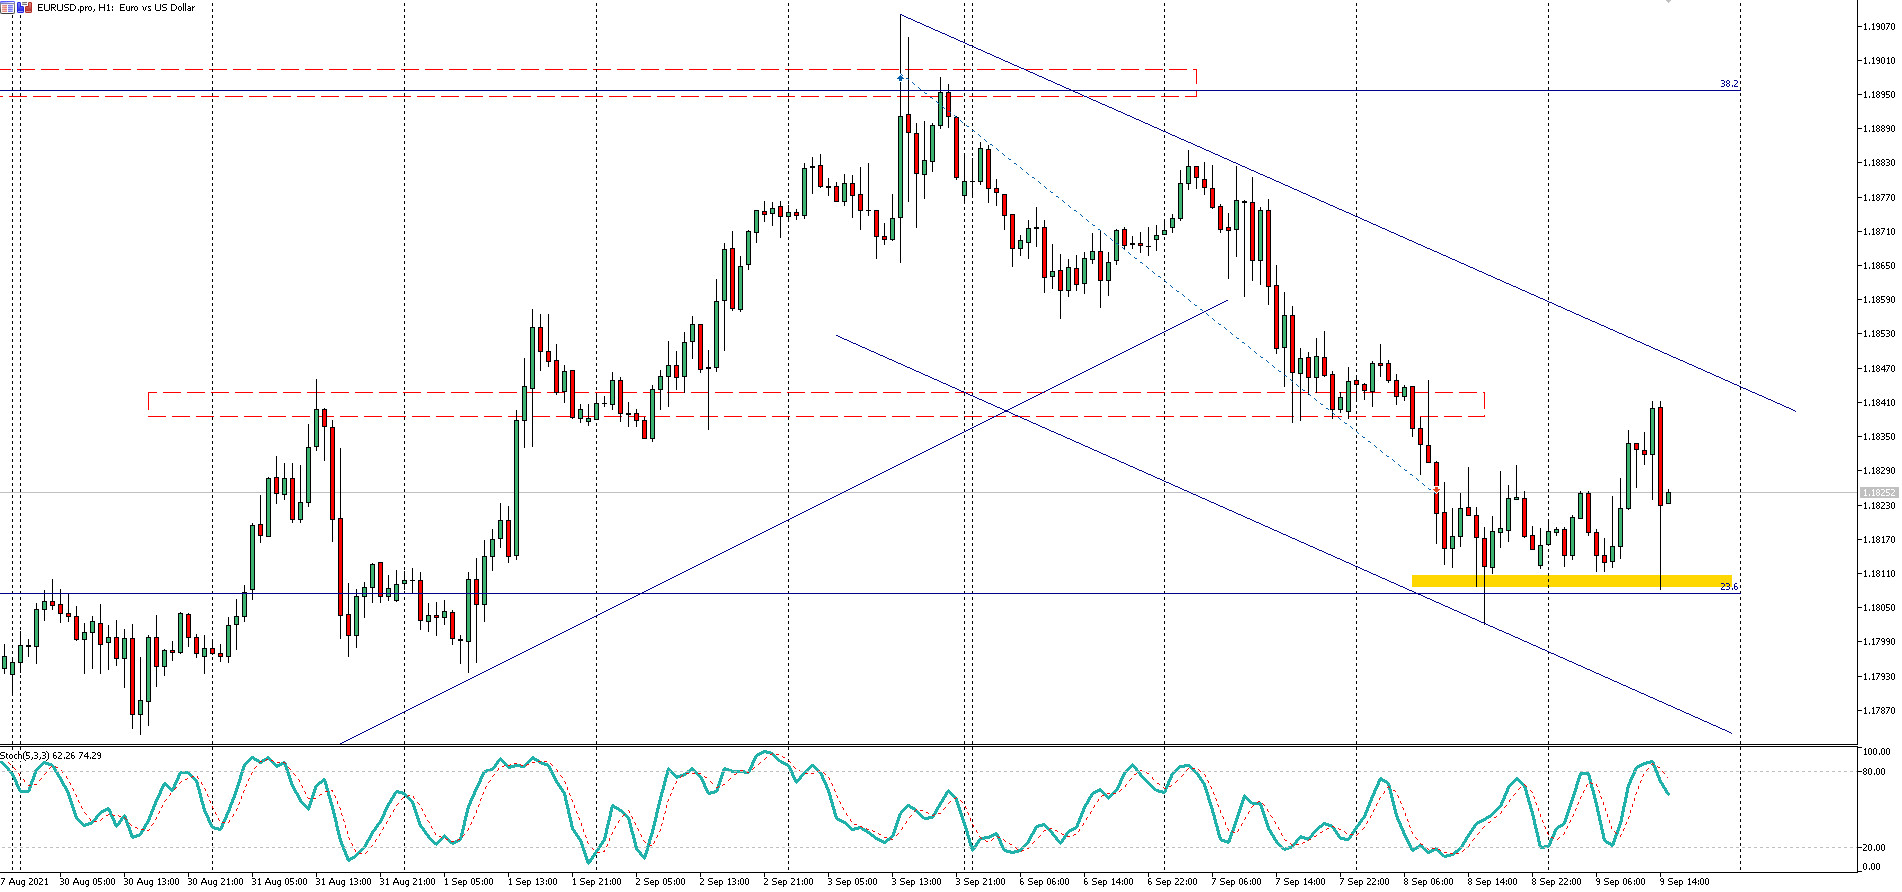 EUR/USD: szybki spadek do 1,1807 i powrót